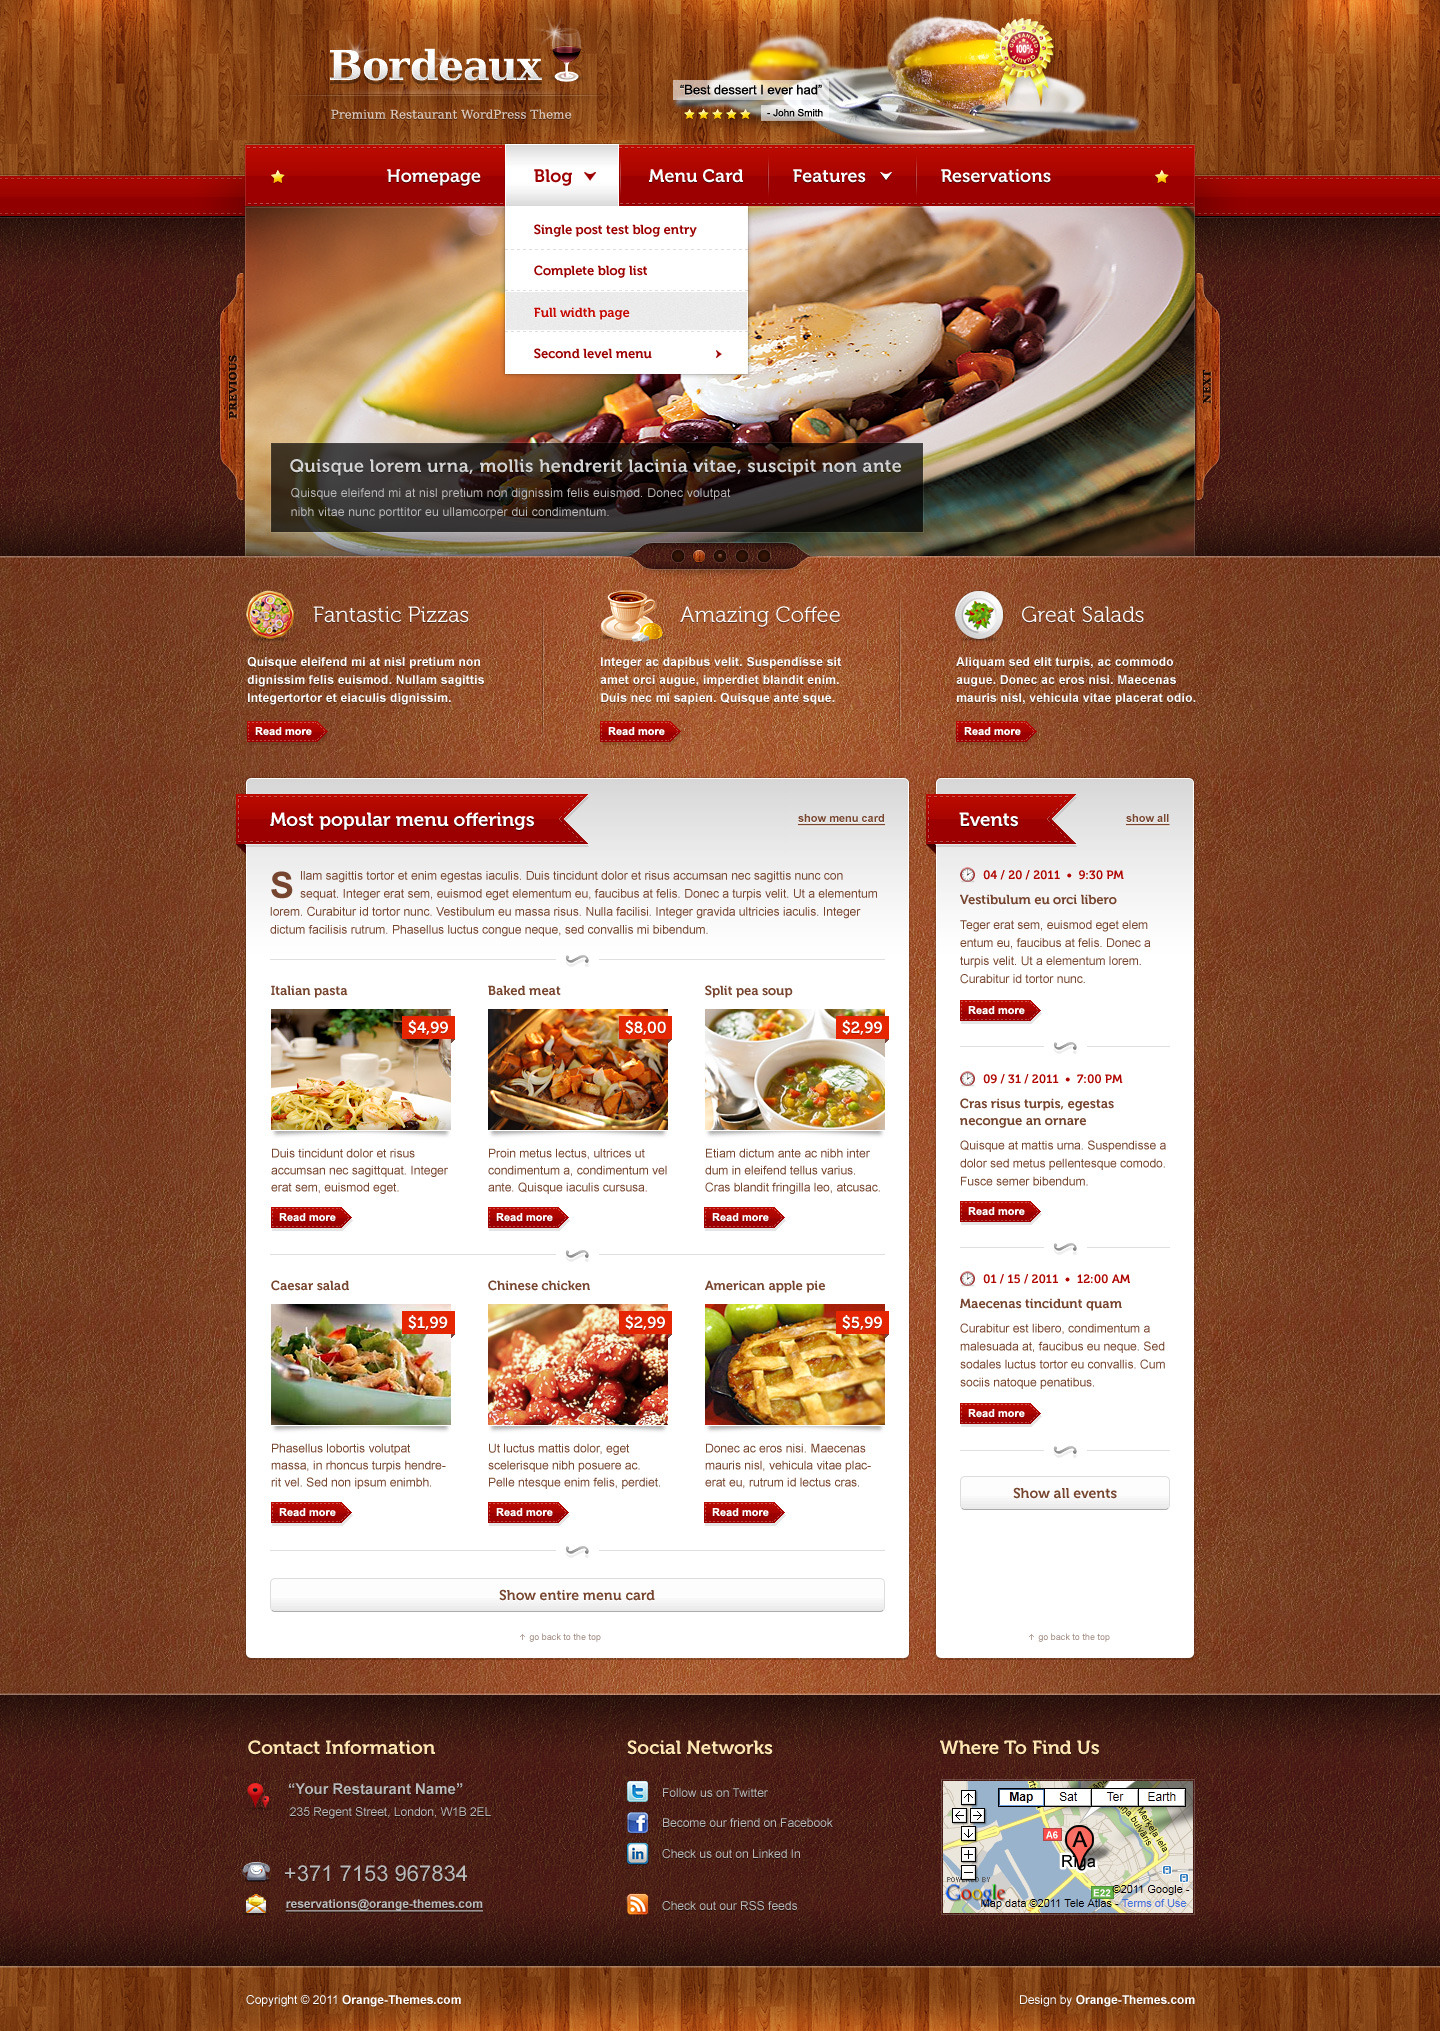 Bordeaux - Premium Restaurant Theme - Premium wordpress themes|Restaurant